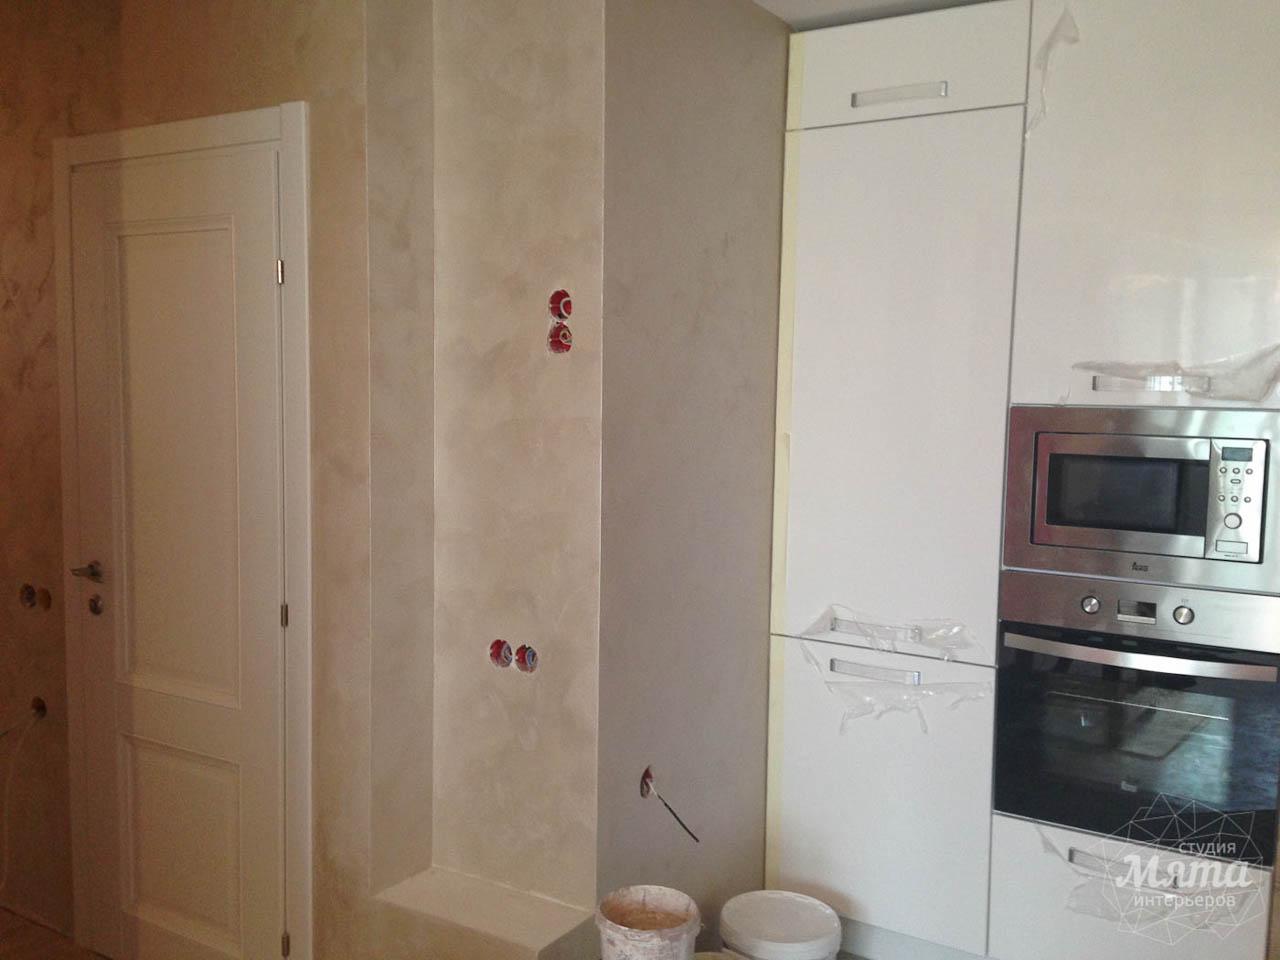 Дизайн интерьера и ремонт трехкомнатной квартиры по ул. Фучика 9 50